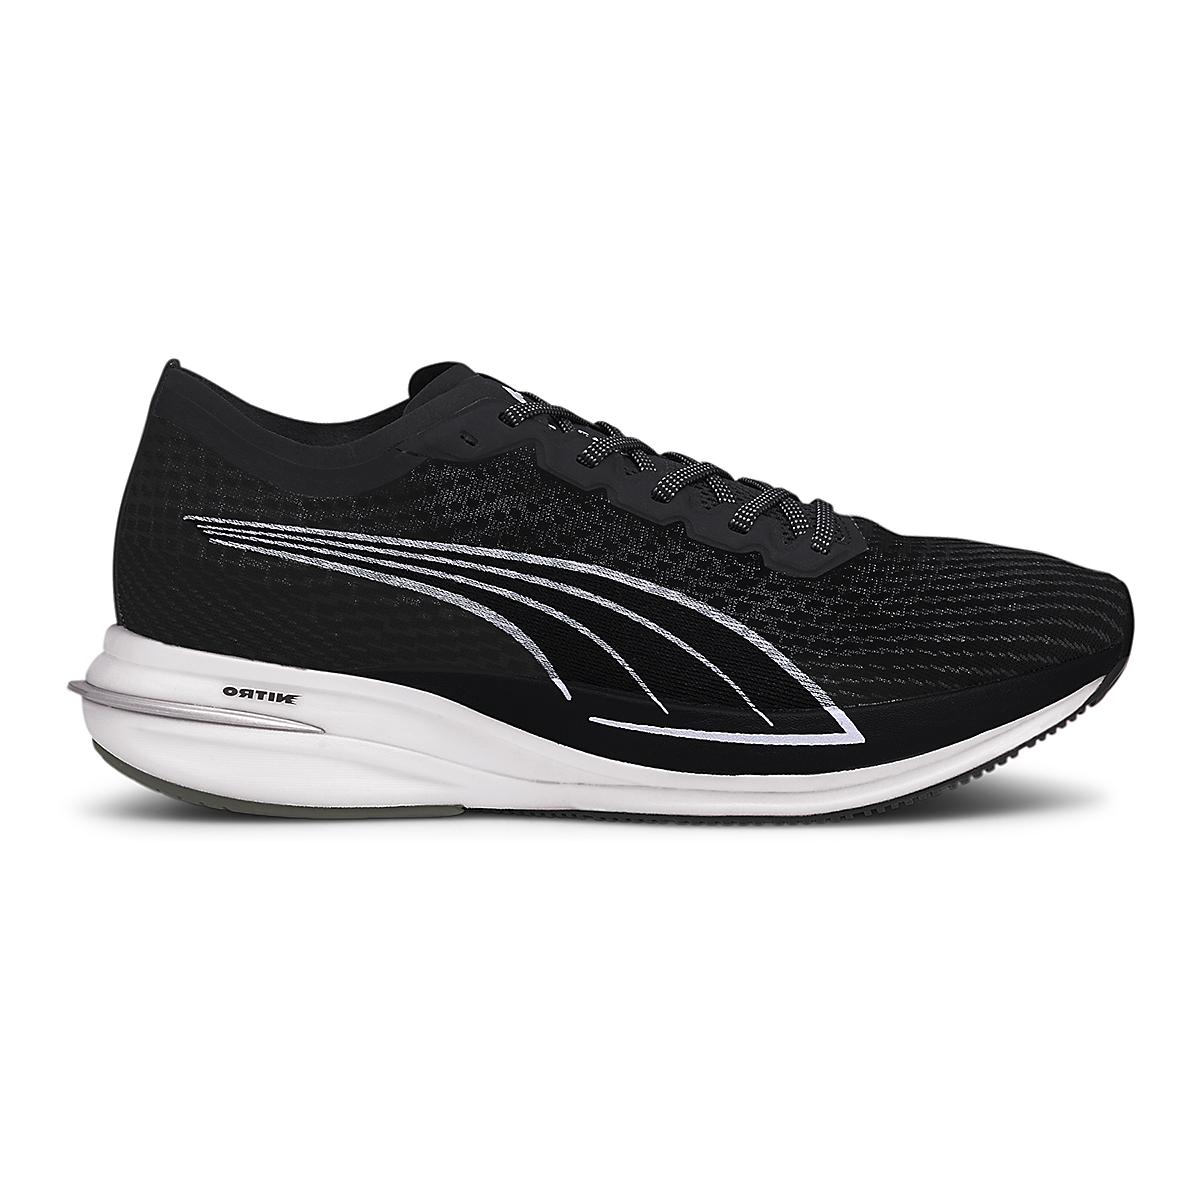 Men's Puma Deviate Nitro Running Shoe - Color: Puma Black-Puma Silver - Size: 7 - Width: Regular, Puma Black-Puma Silver, large, image 1